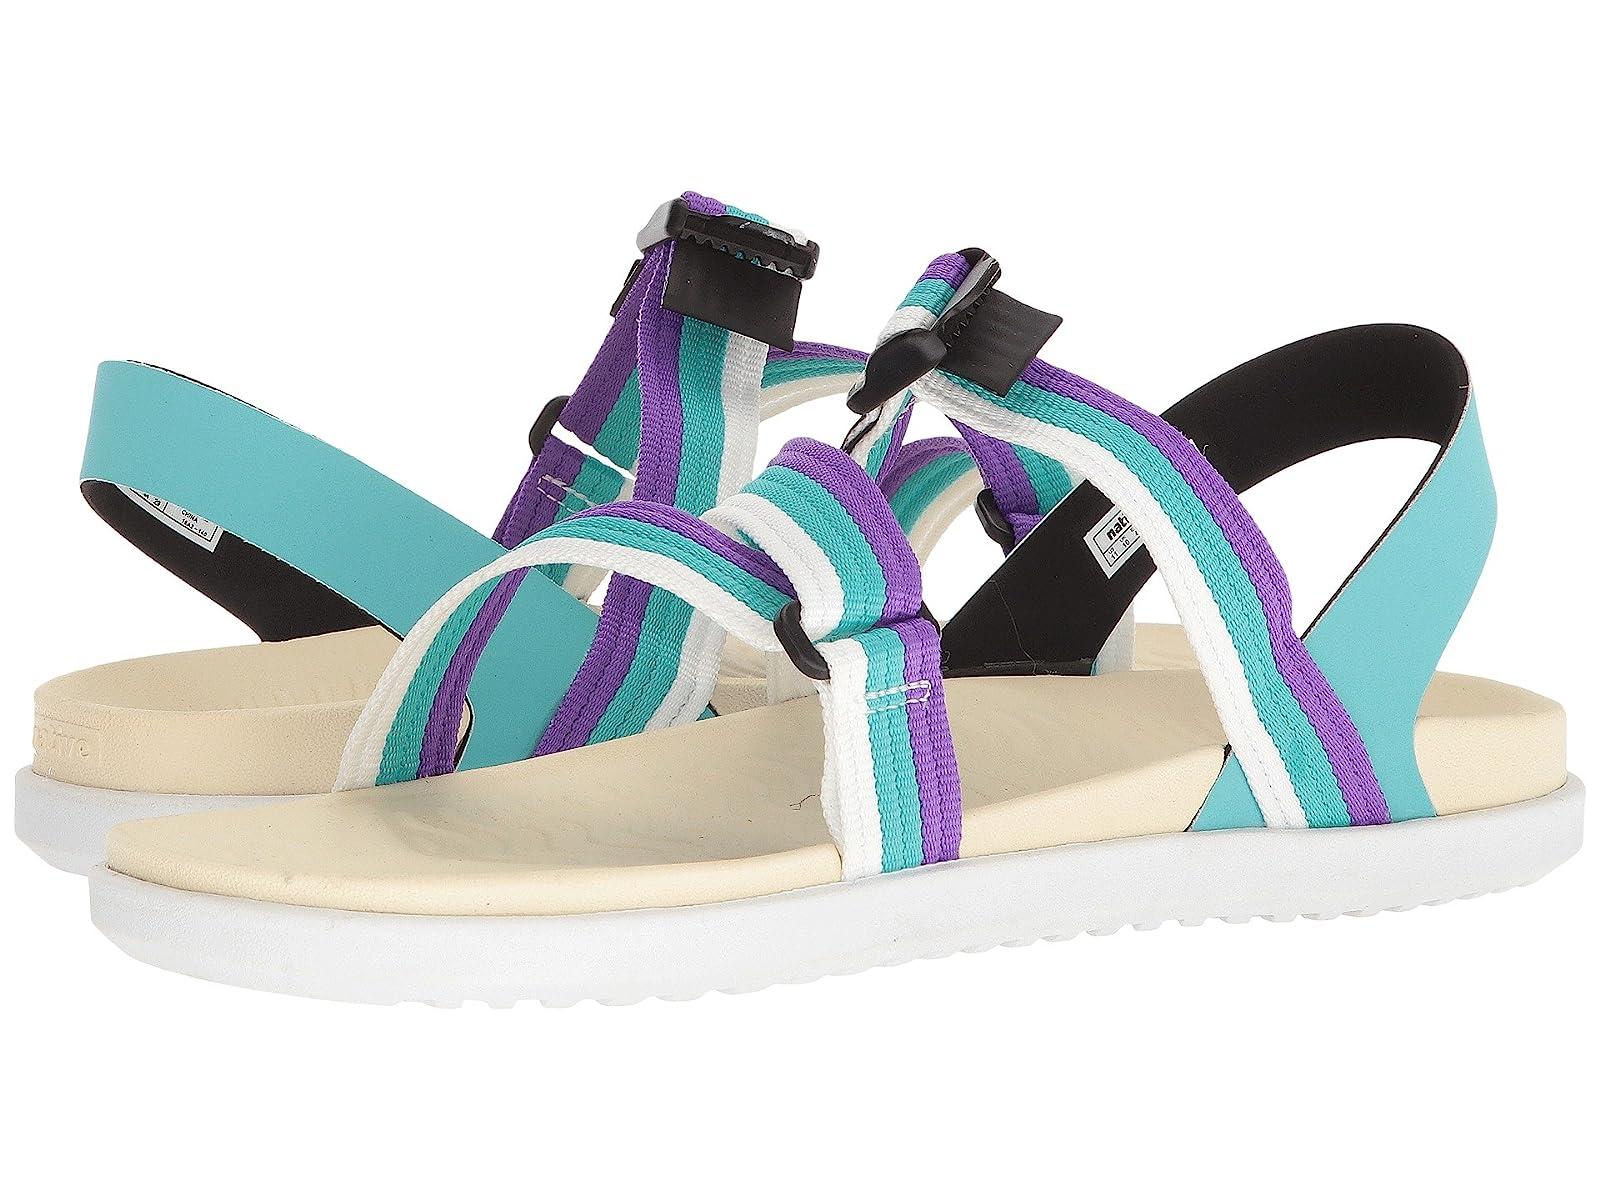 Native Shoes ZurichAtmospheric grades have affordable shoes